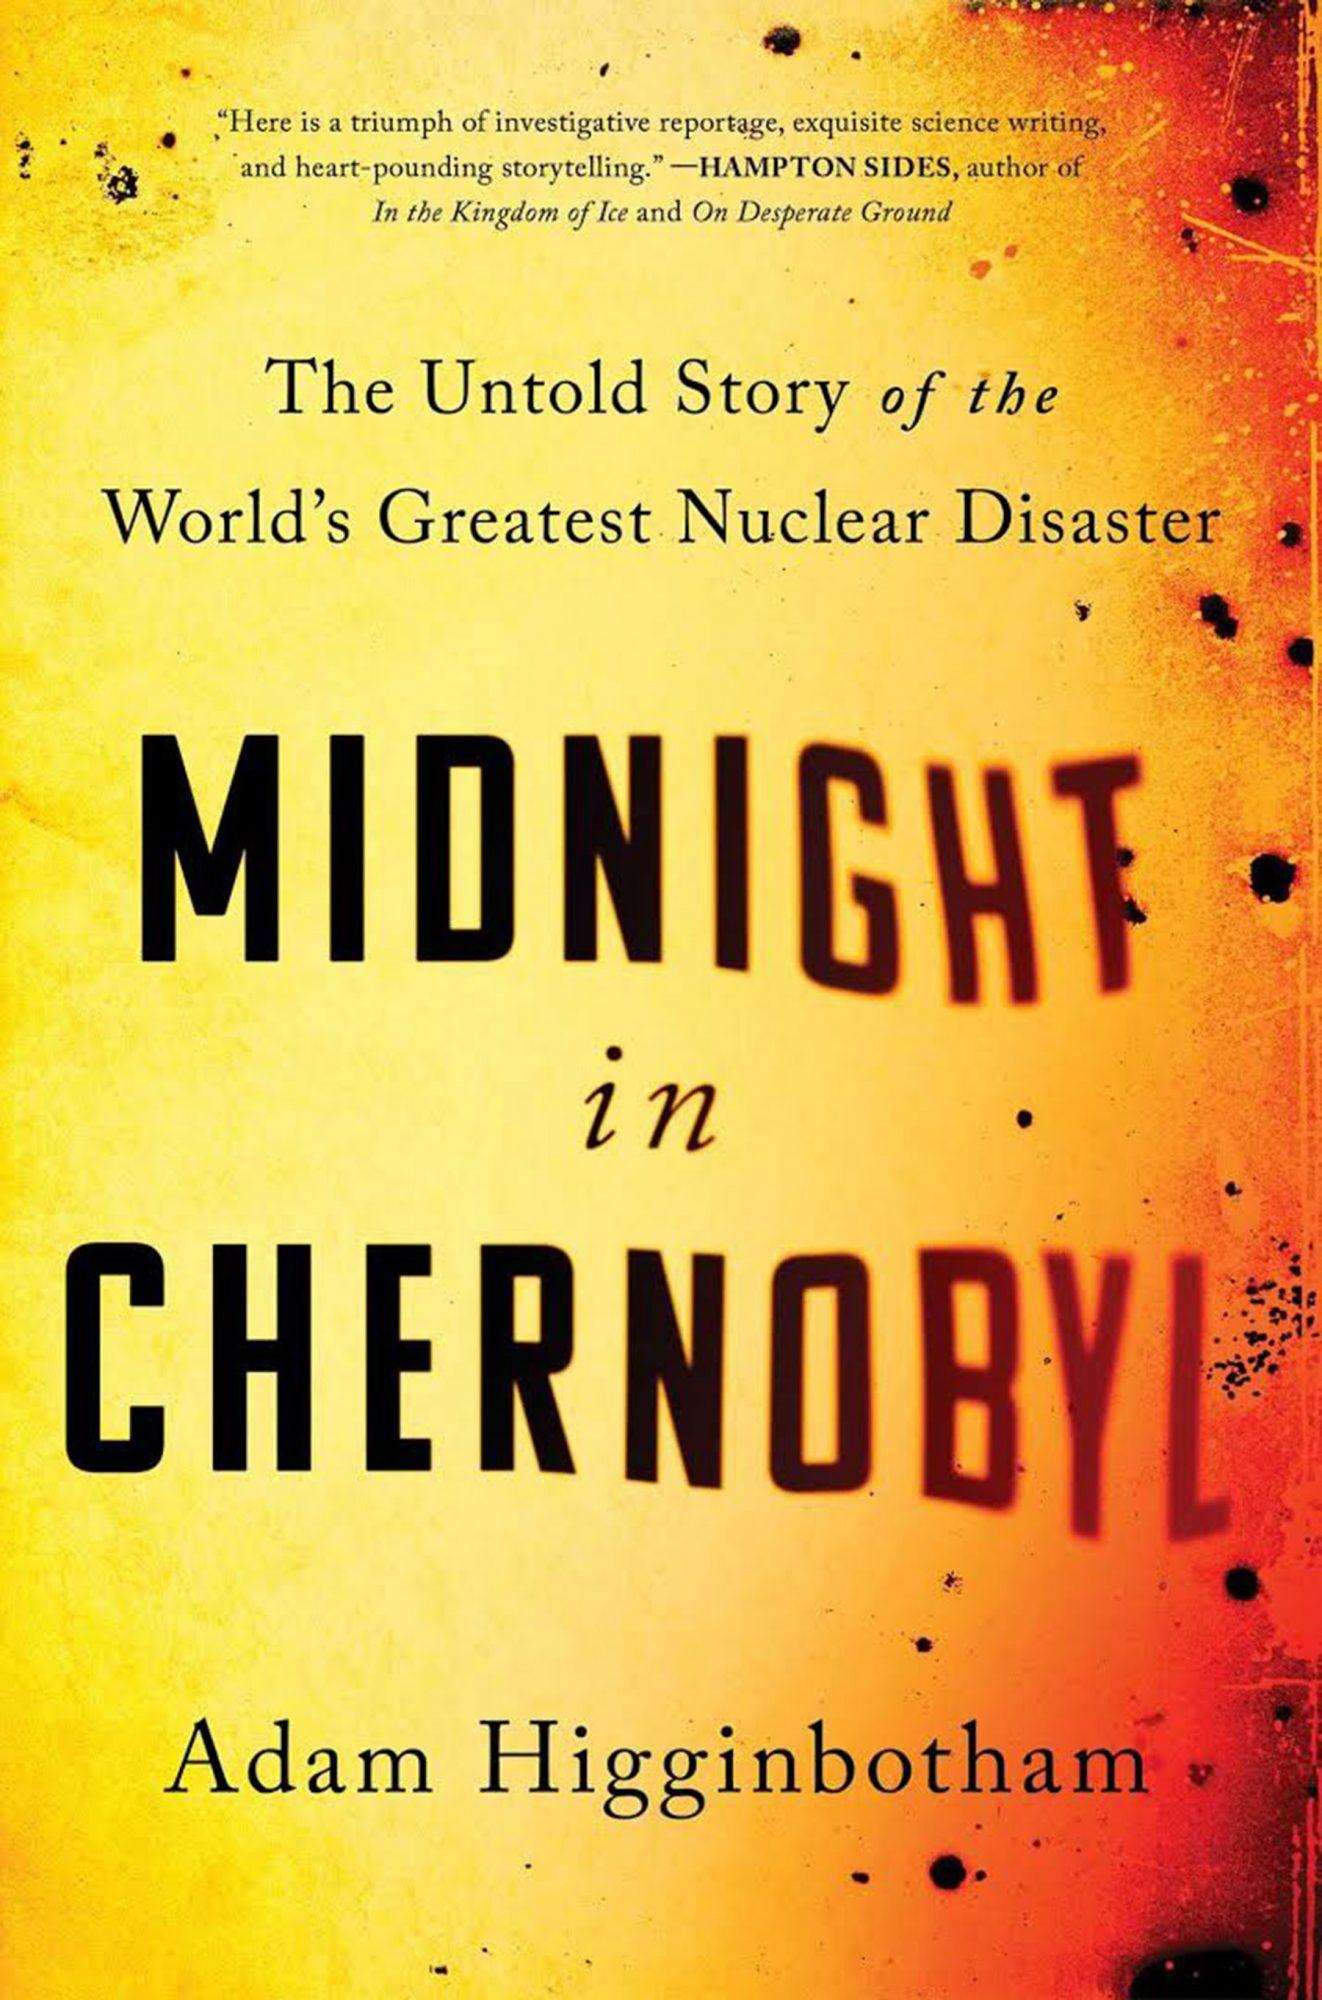 Midnight in Chernobyl by Adam HigginbothamCR: Simon & Schuster